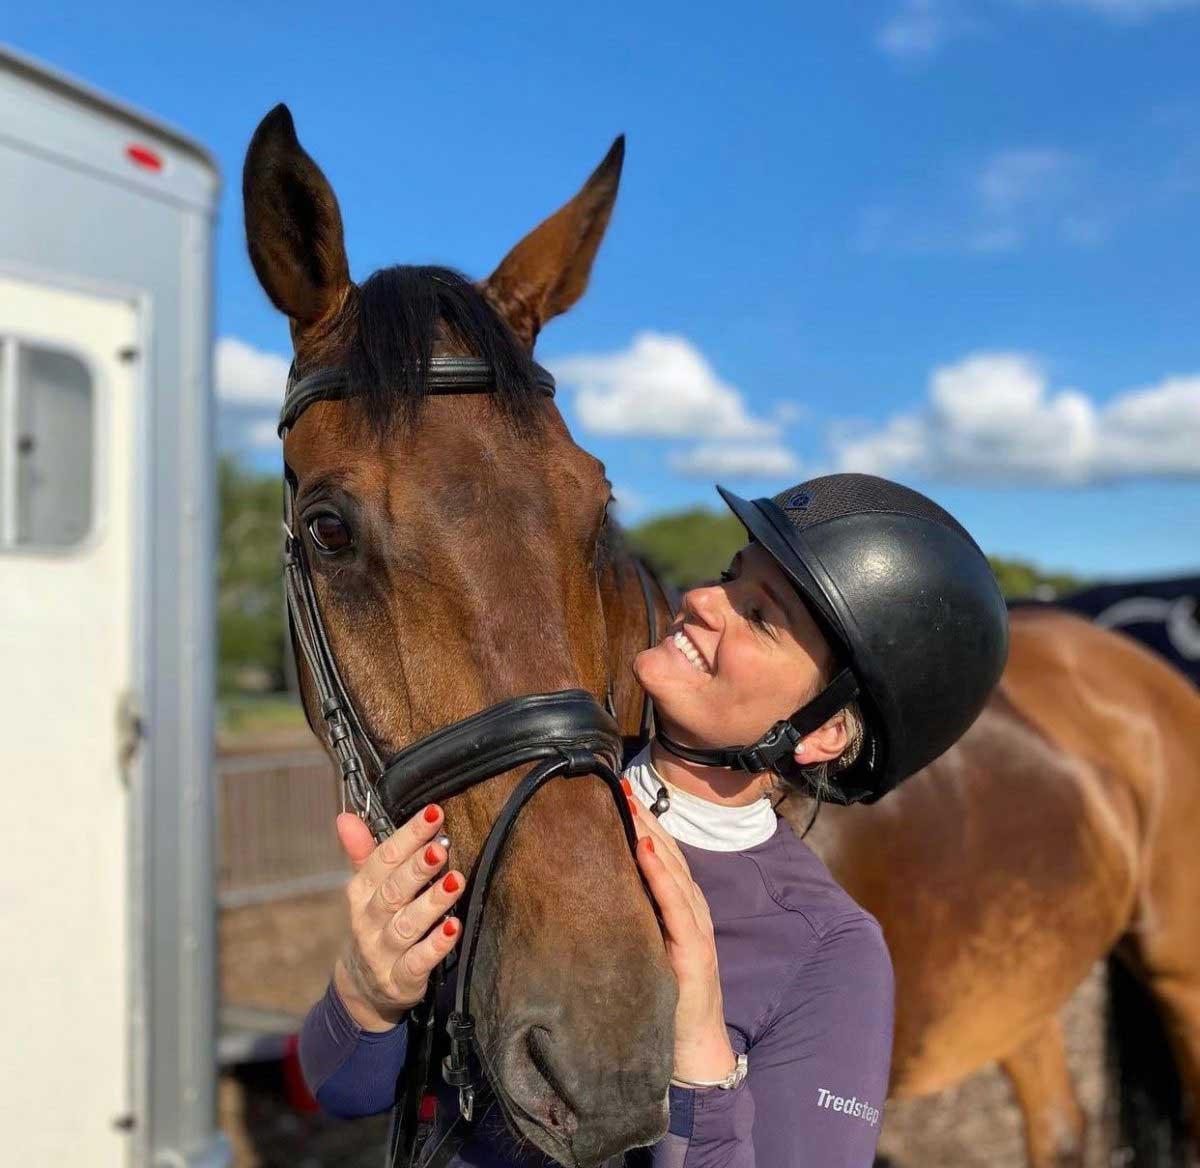 Behind the stable door: Esib Power and Doonaveeragh O One